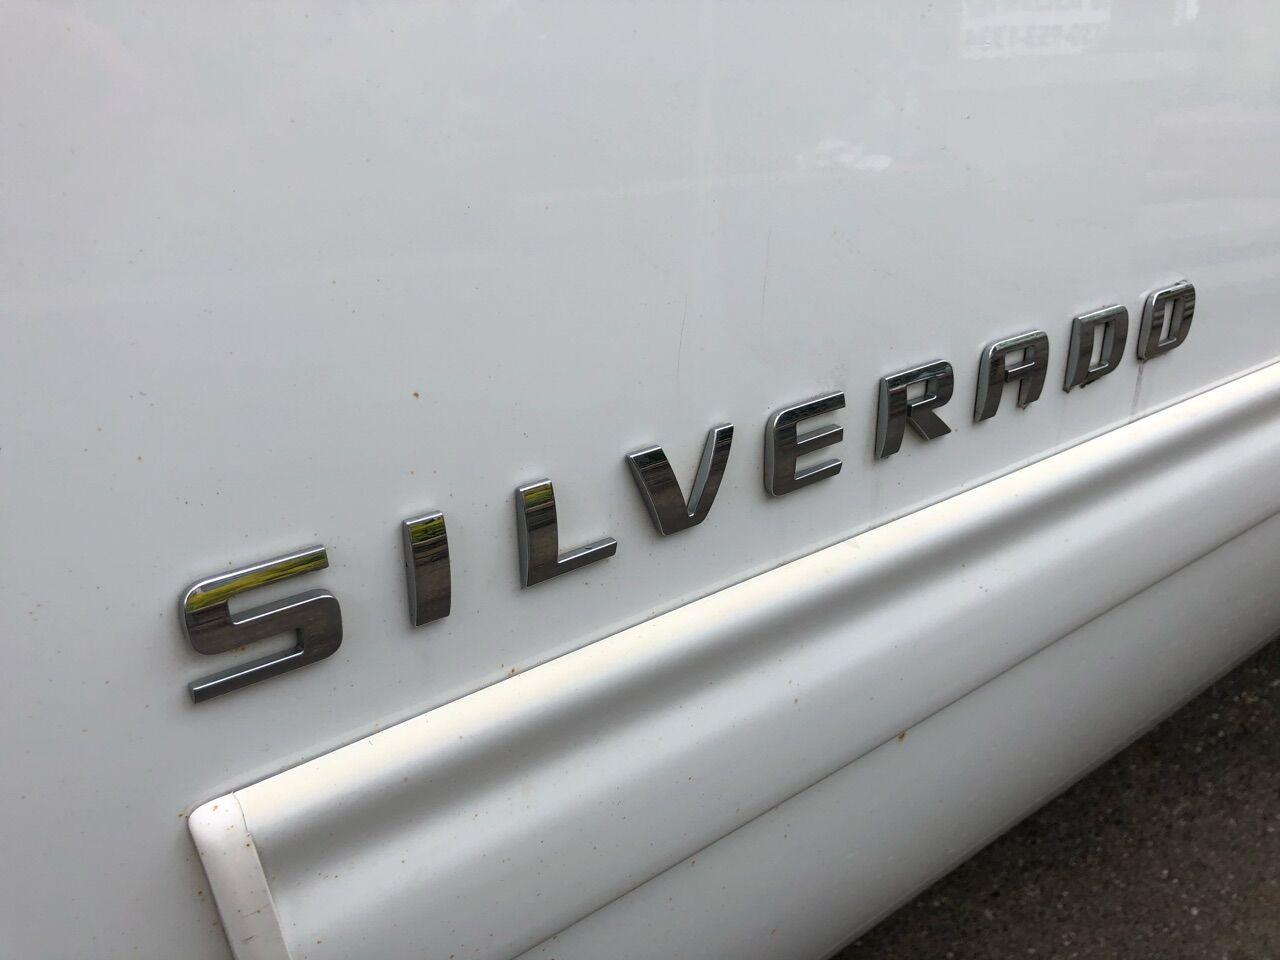 2012 Chevrolet Silverado 1500 Hybrid Short Bed